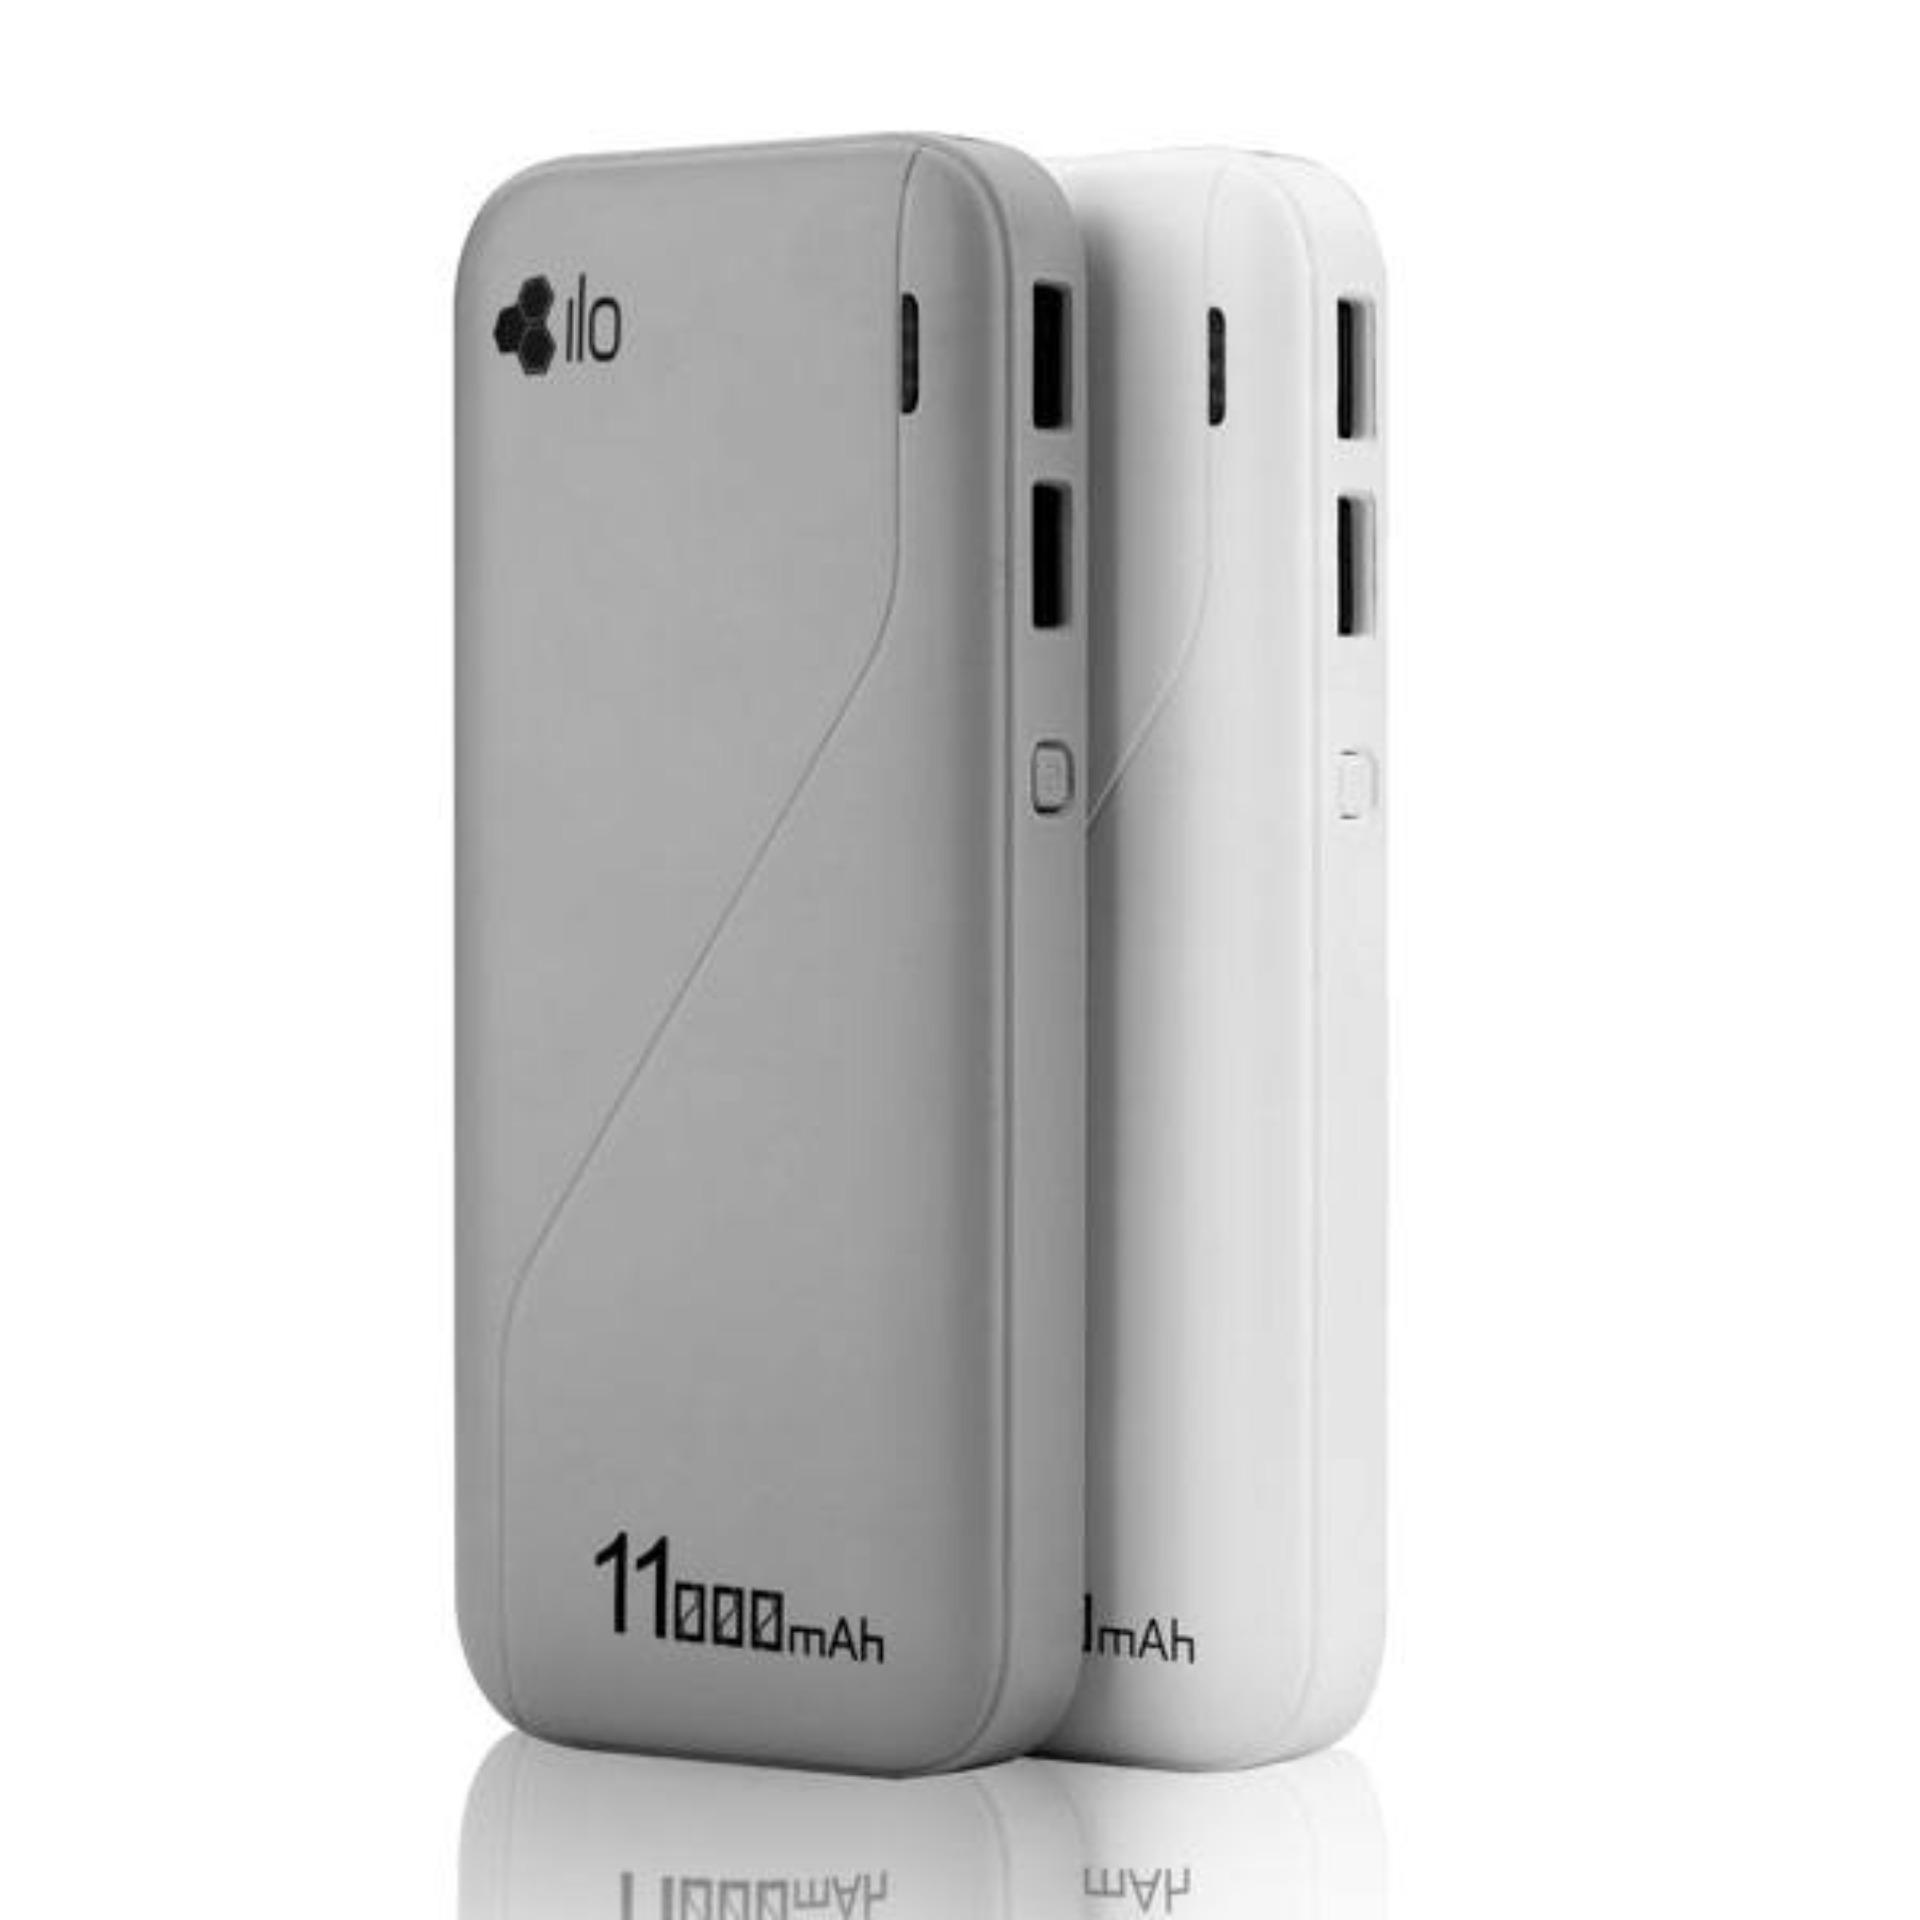 Hippo Powerbank Smore 15000 mAh Simple Pack. Source ... Hippo Ilo F2 11000